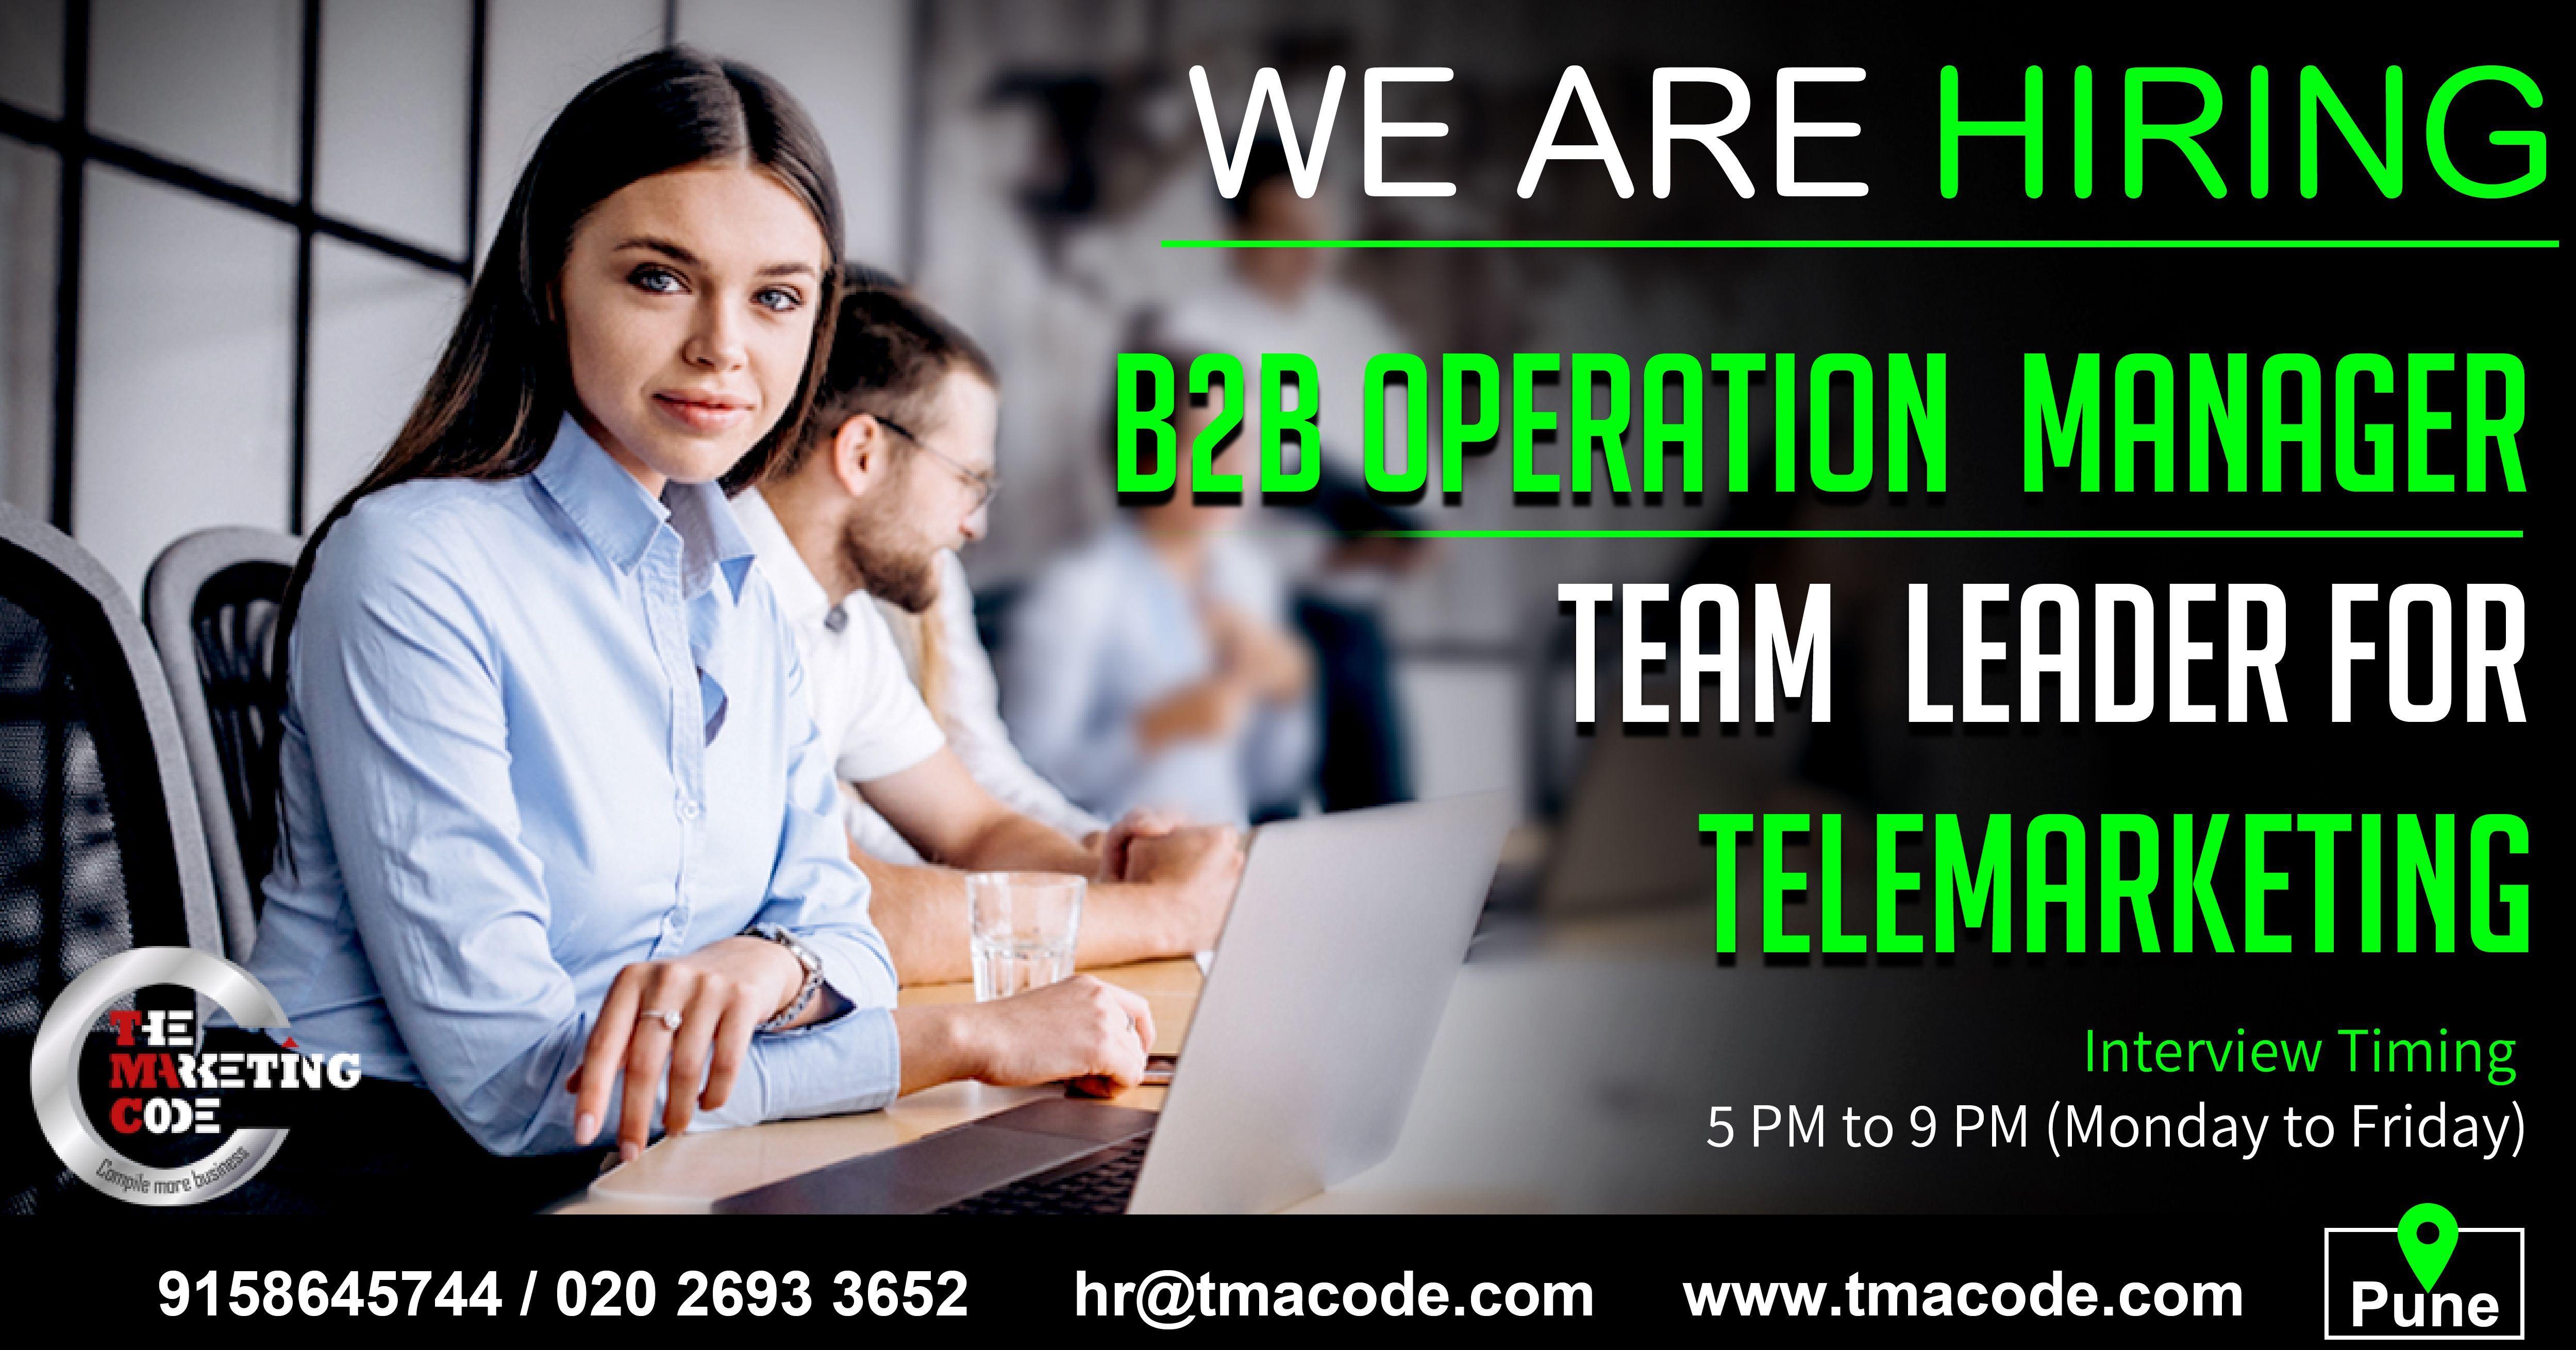 Job Hiring Operations Management Job Opening We Are Hiring